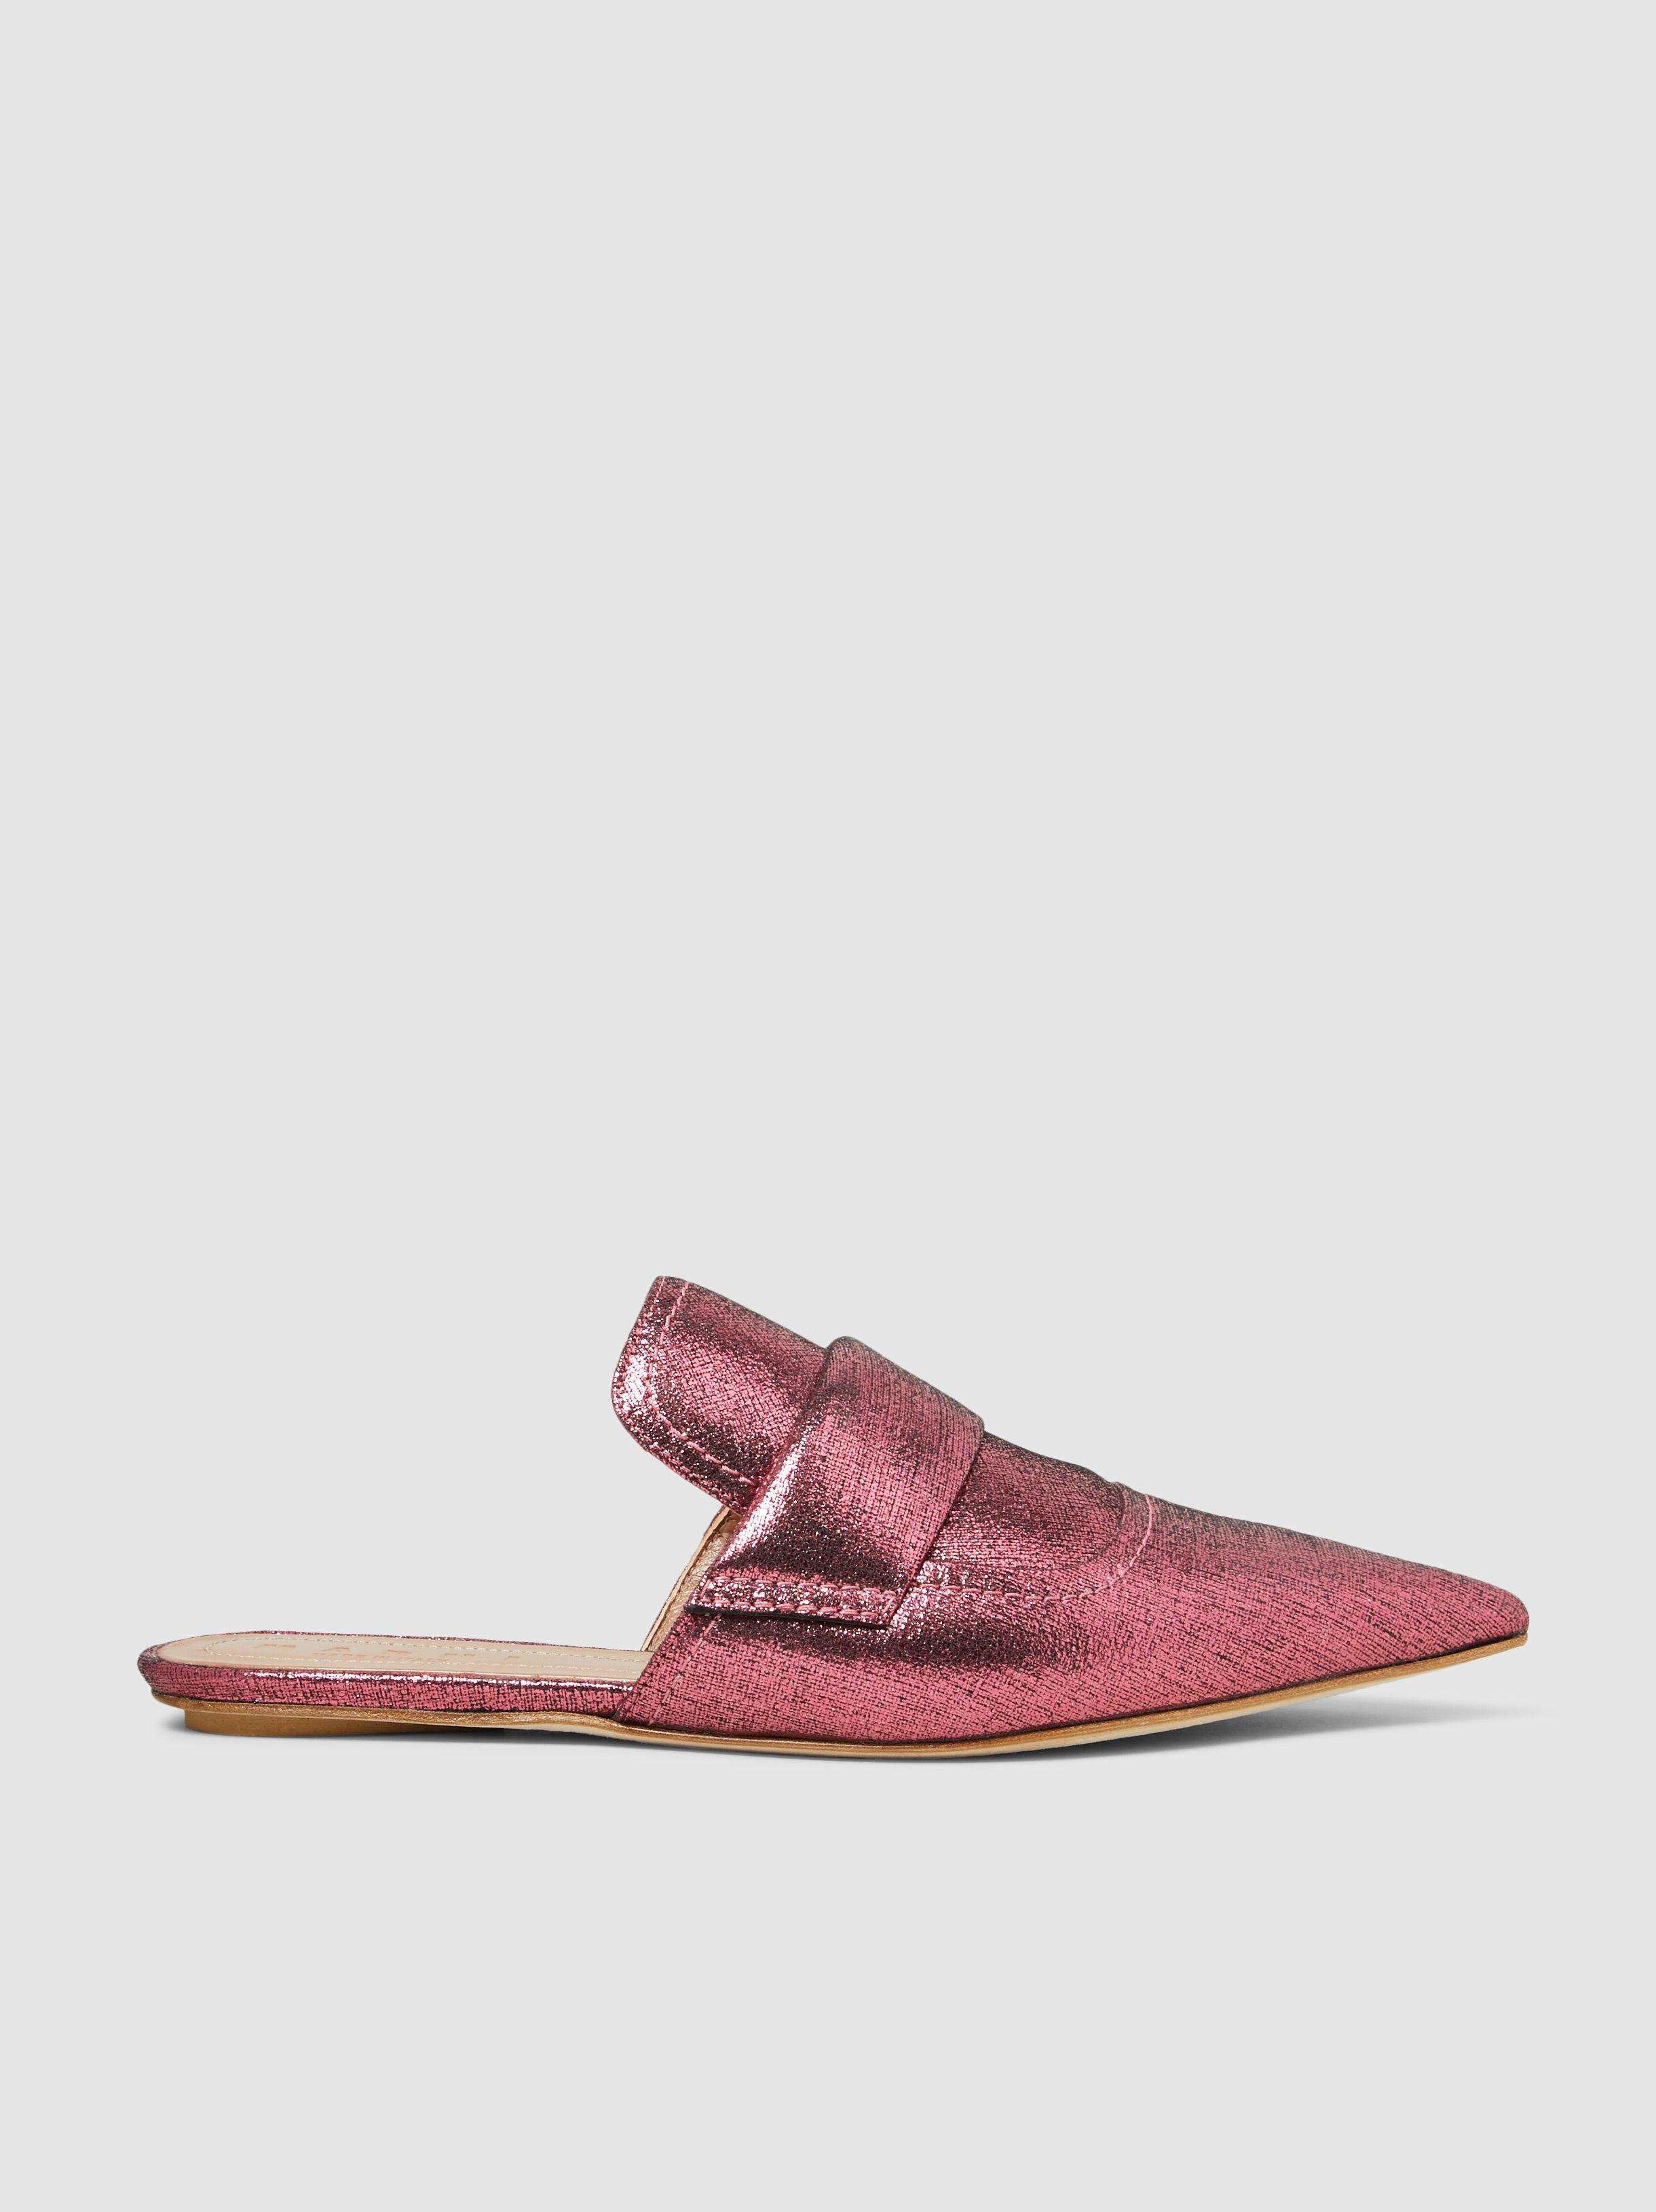 Marni Burnished Metallic Leather Loafer Slippers GpujM